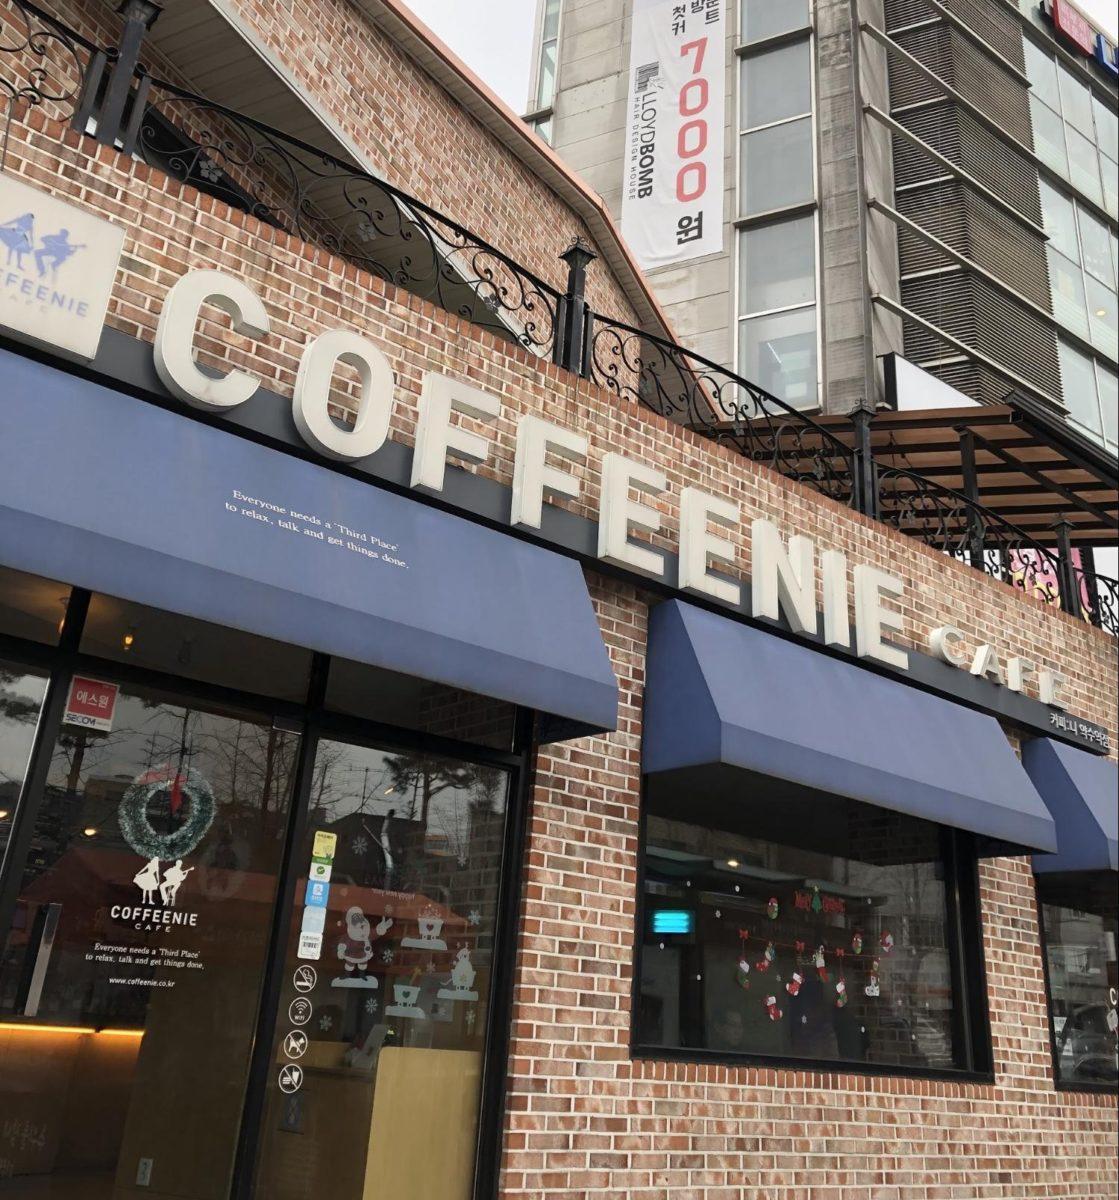 COFFEENIE (地下鉄3号線333・6号線633ヤクス약수駅)